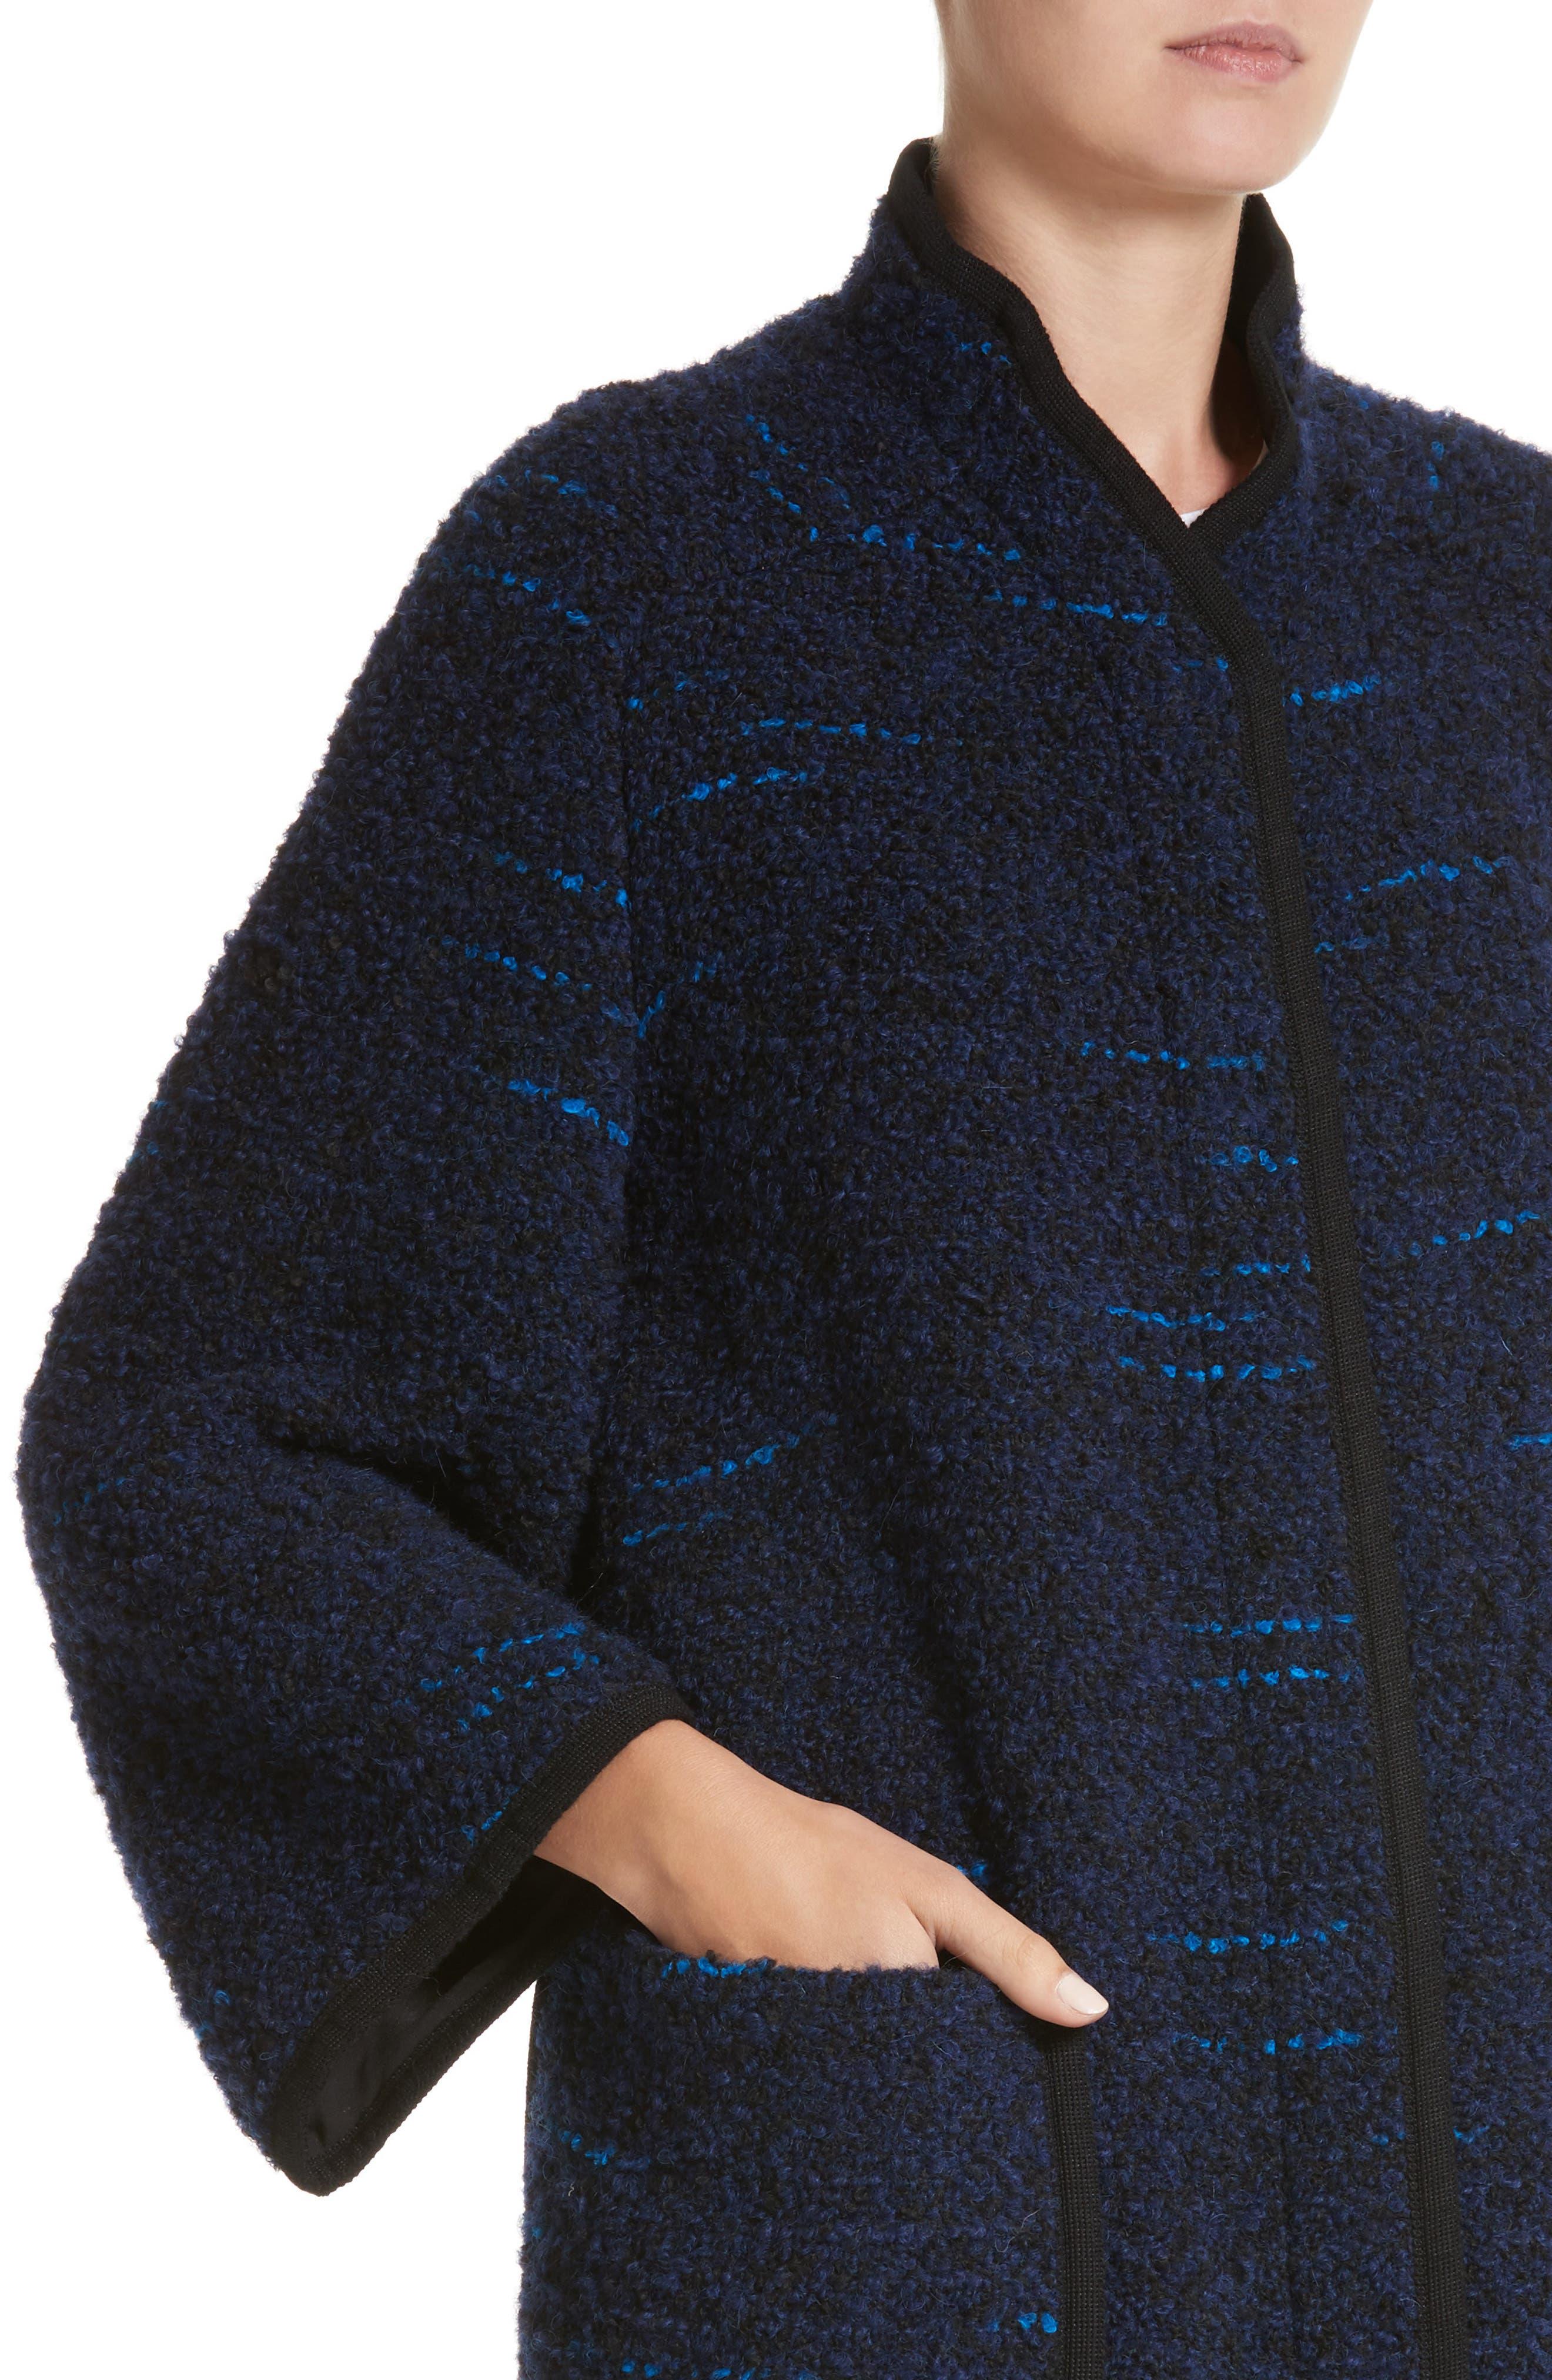 Wool Blend Swing Coat,                             Alternate thumbnail 4, color,                             Navy / Blue Multi